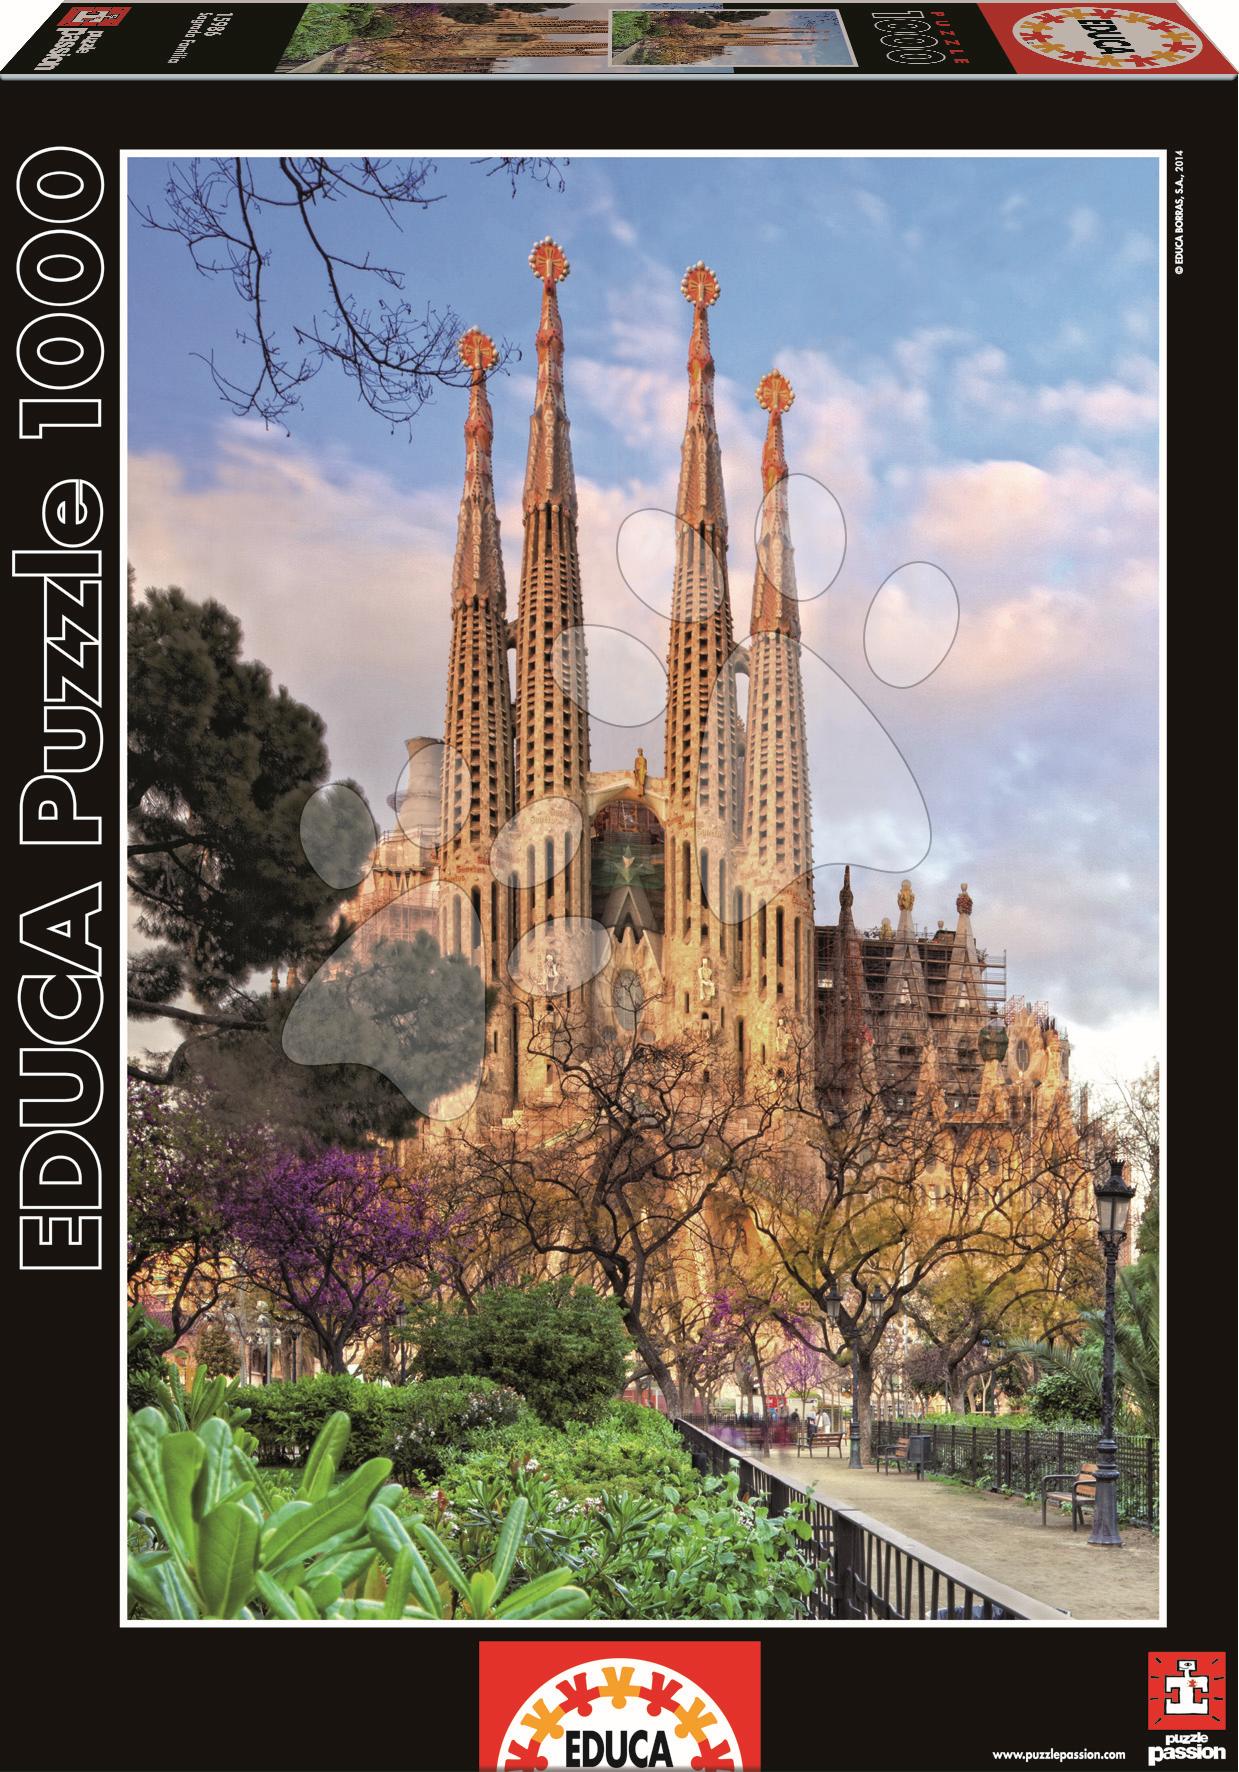 Puzzle Genuine Sagrada Familia Educa 1000 dílů od 12 let